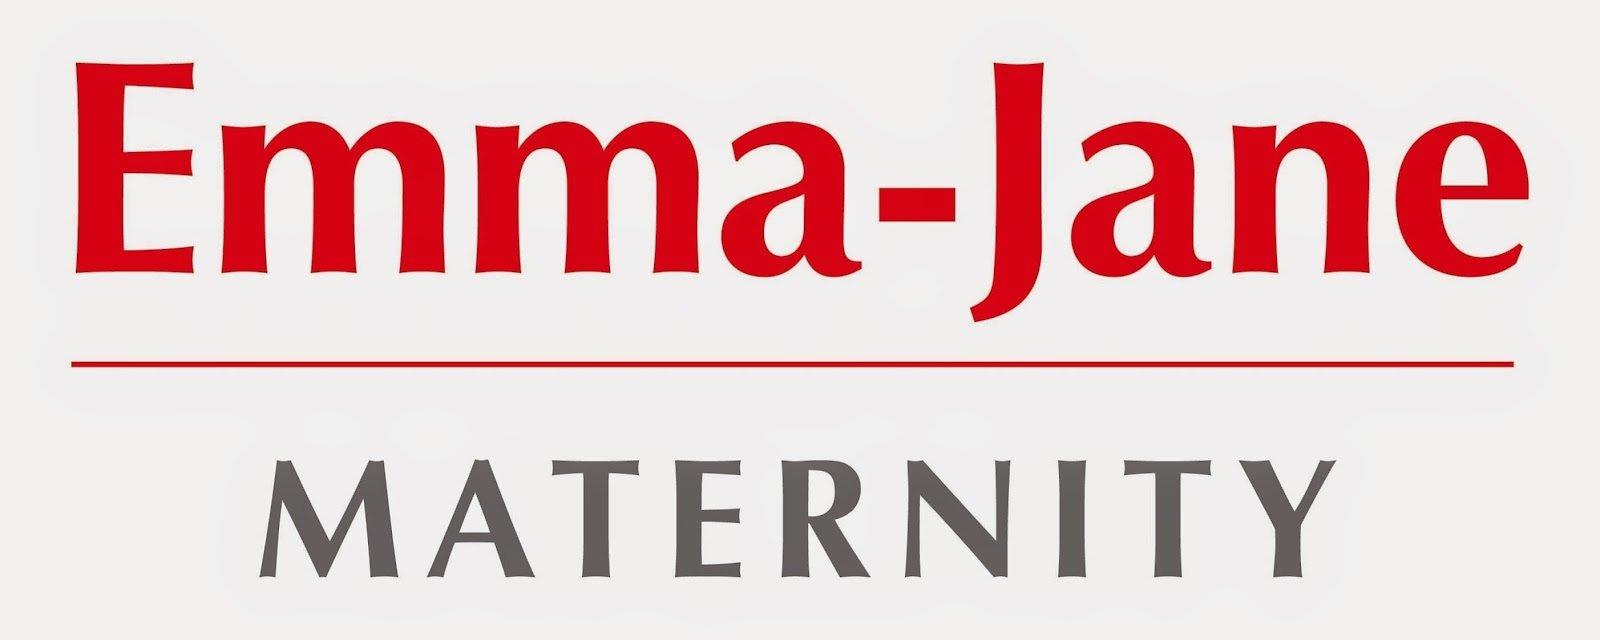 emma jane maternity logo